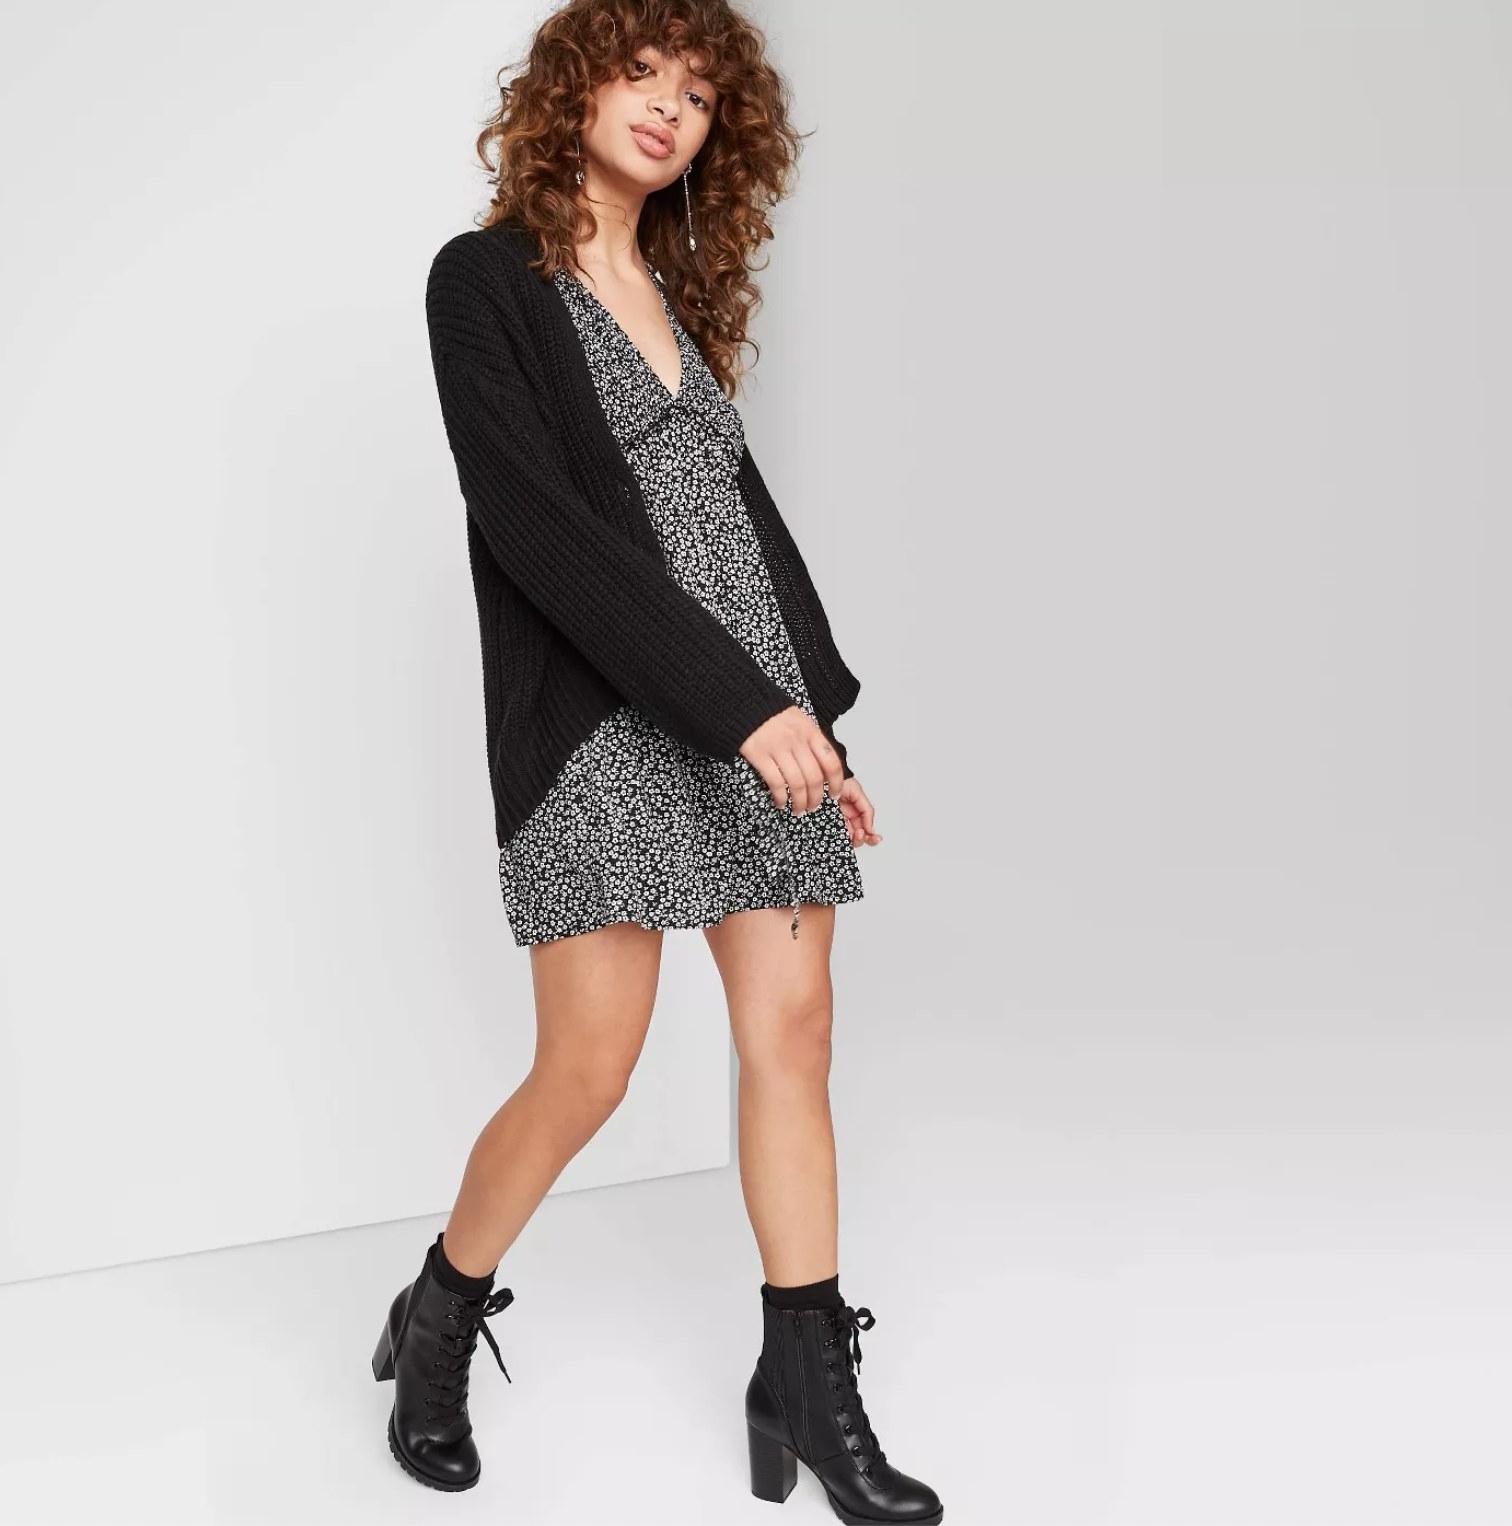 Model wearing the cardigan in black